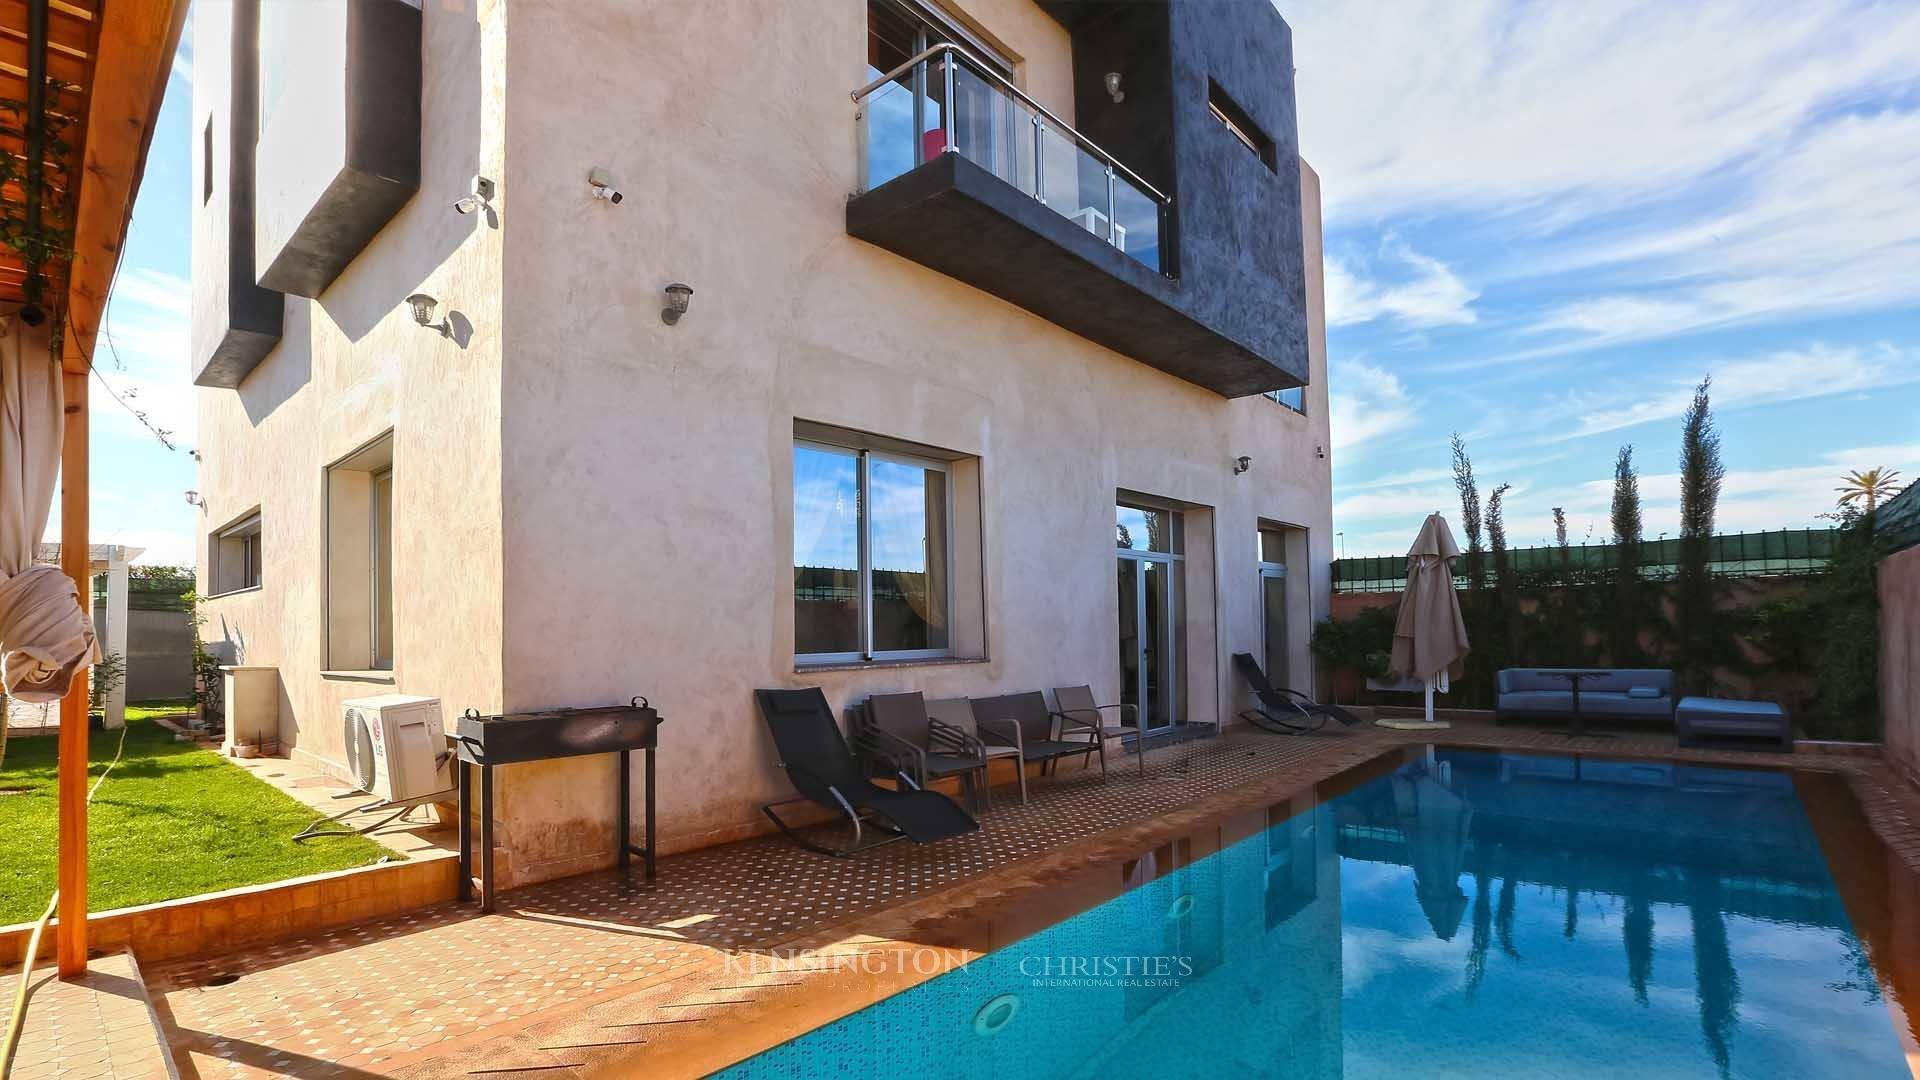 KPPM01343: Villa F Luxury Villa Marrakech Morocco